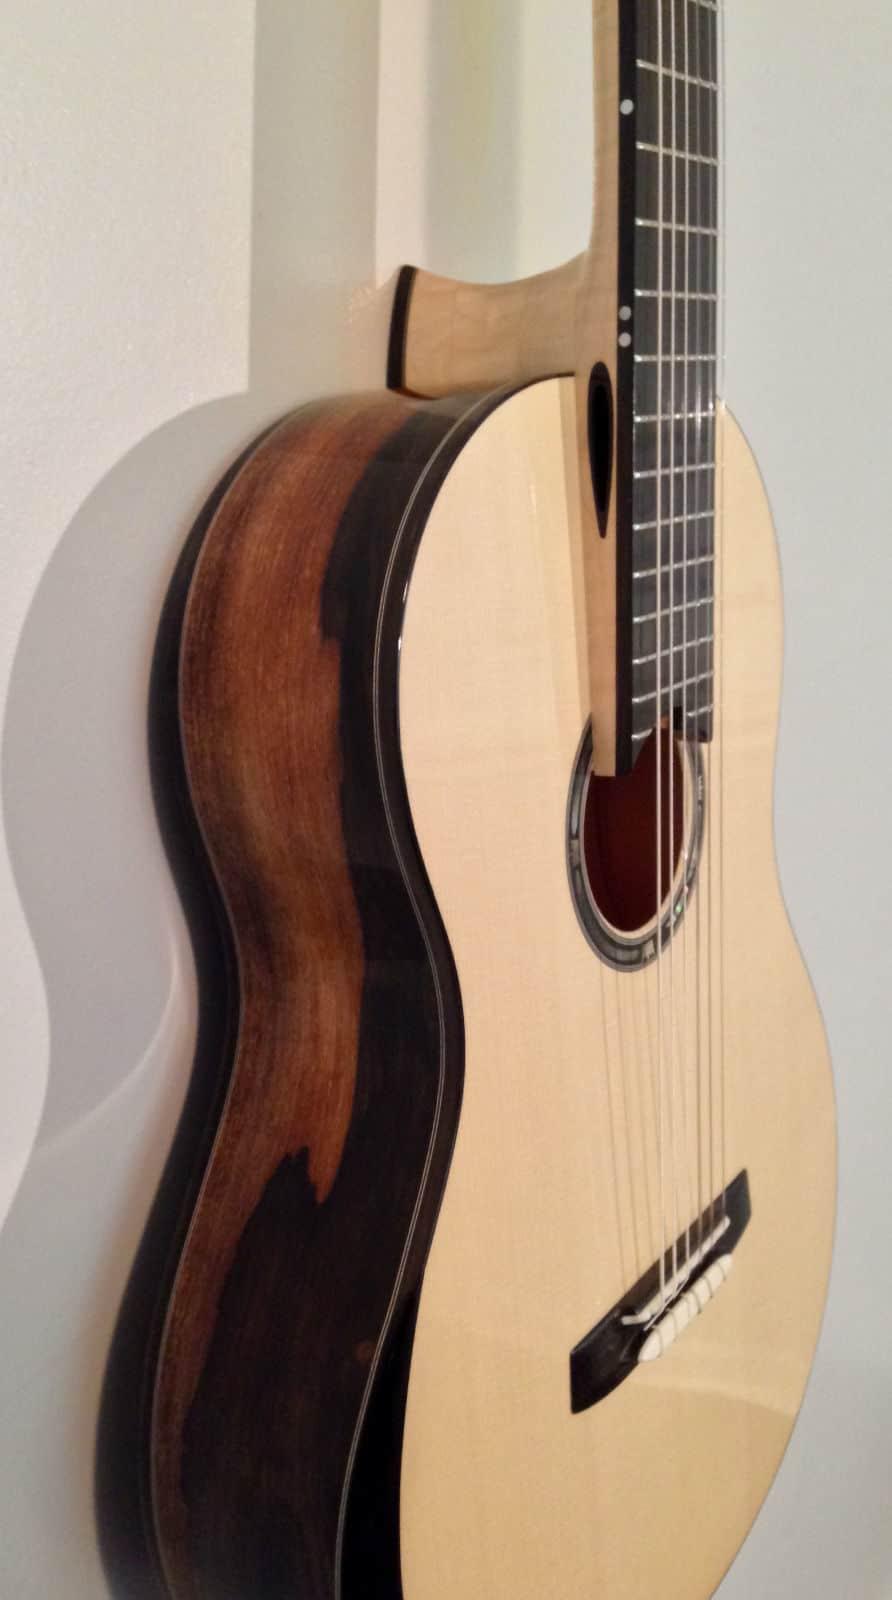 2016 rafal turkowiak classical guitar spruce walnut reverb. Black Bedroom Furniture Sets. Home Design Ideas